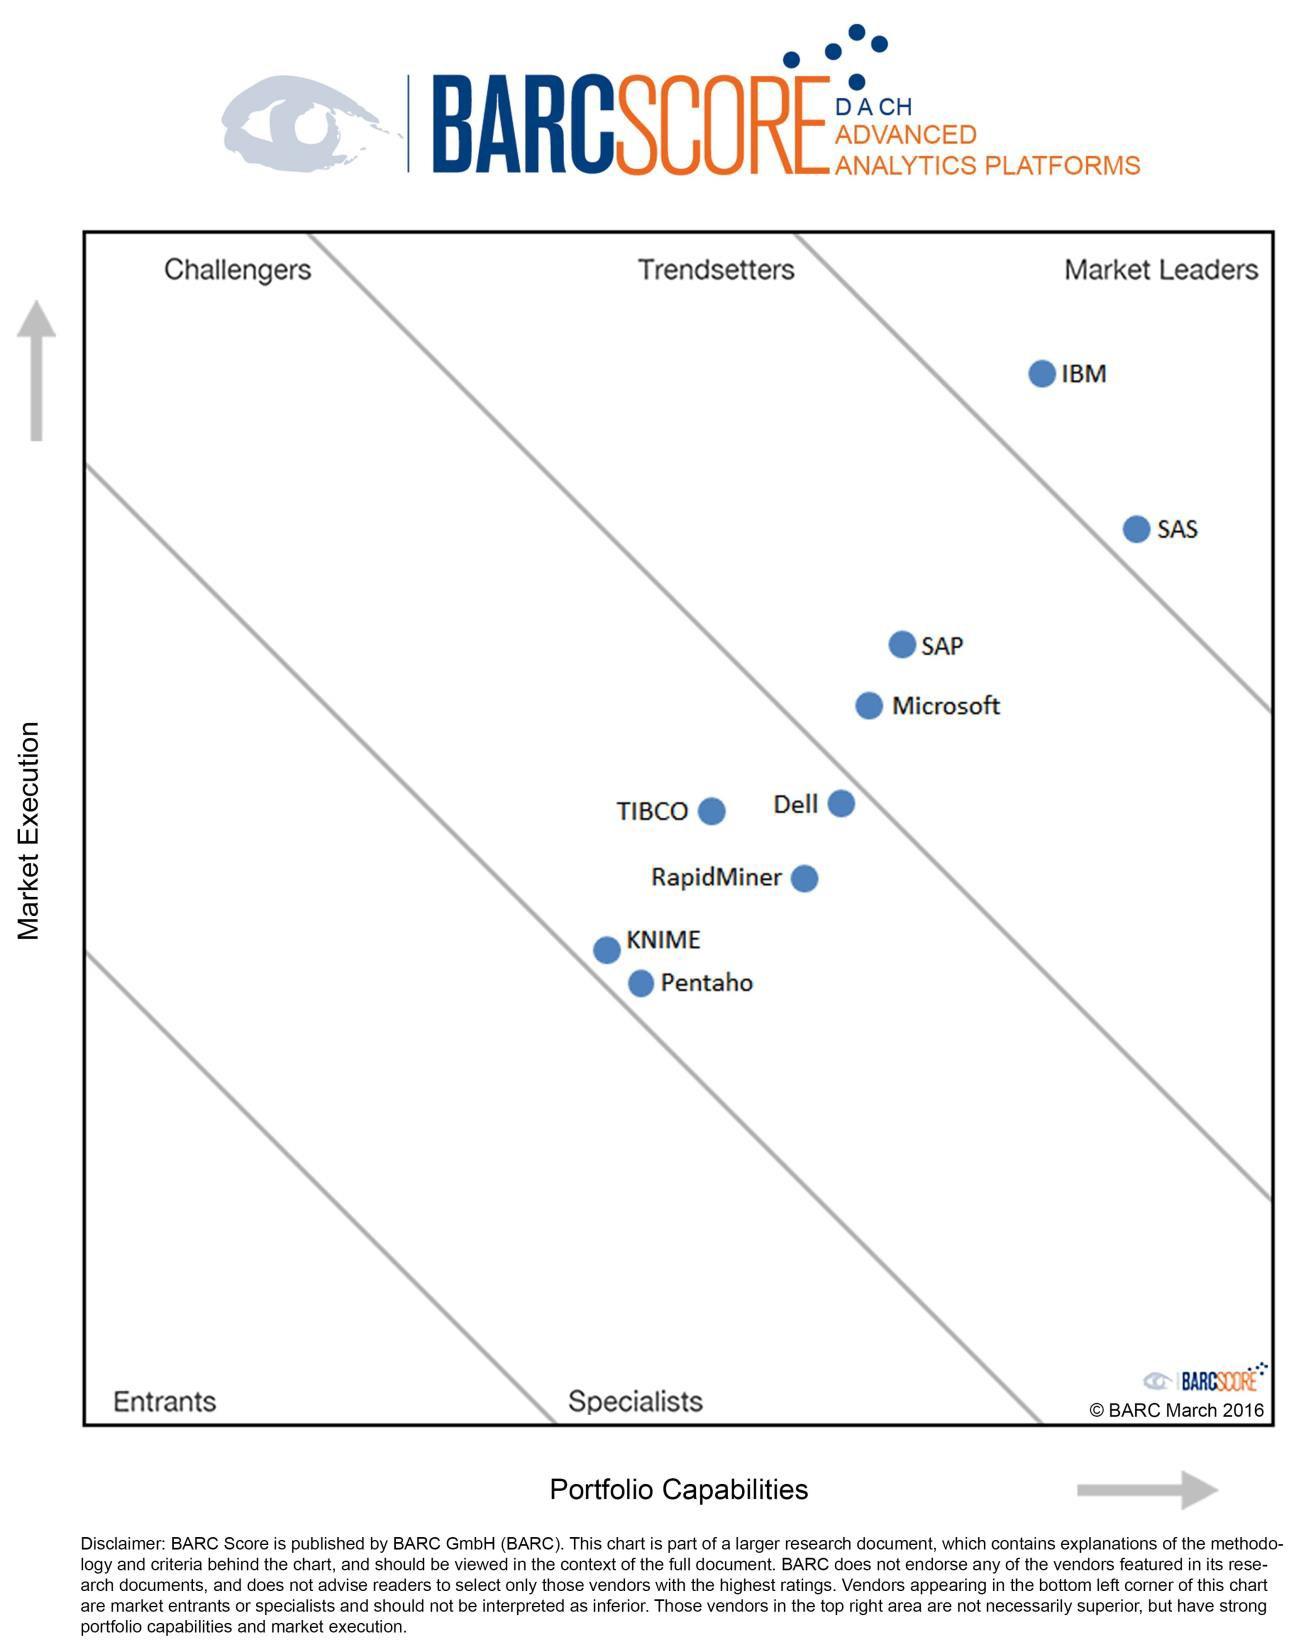 grafik barc advanced analytics